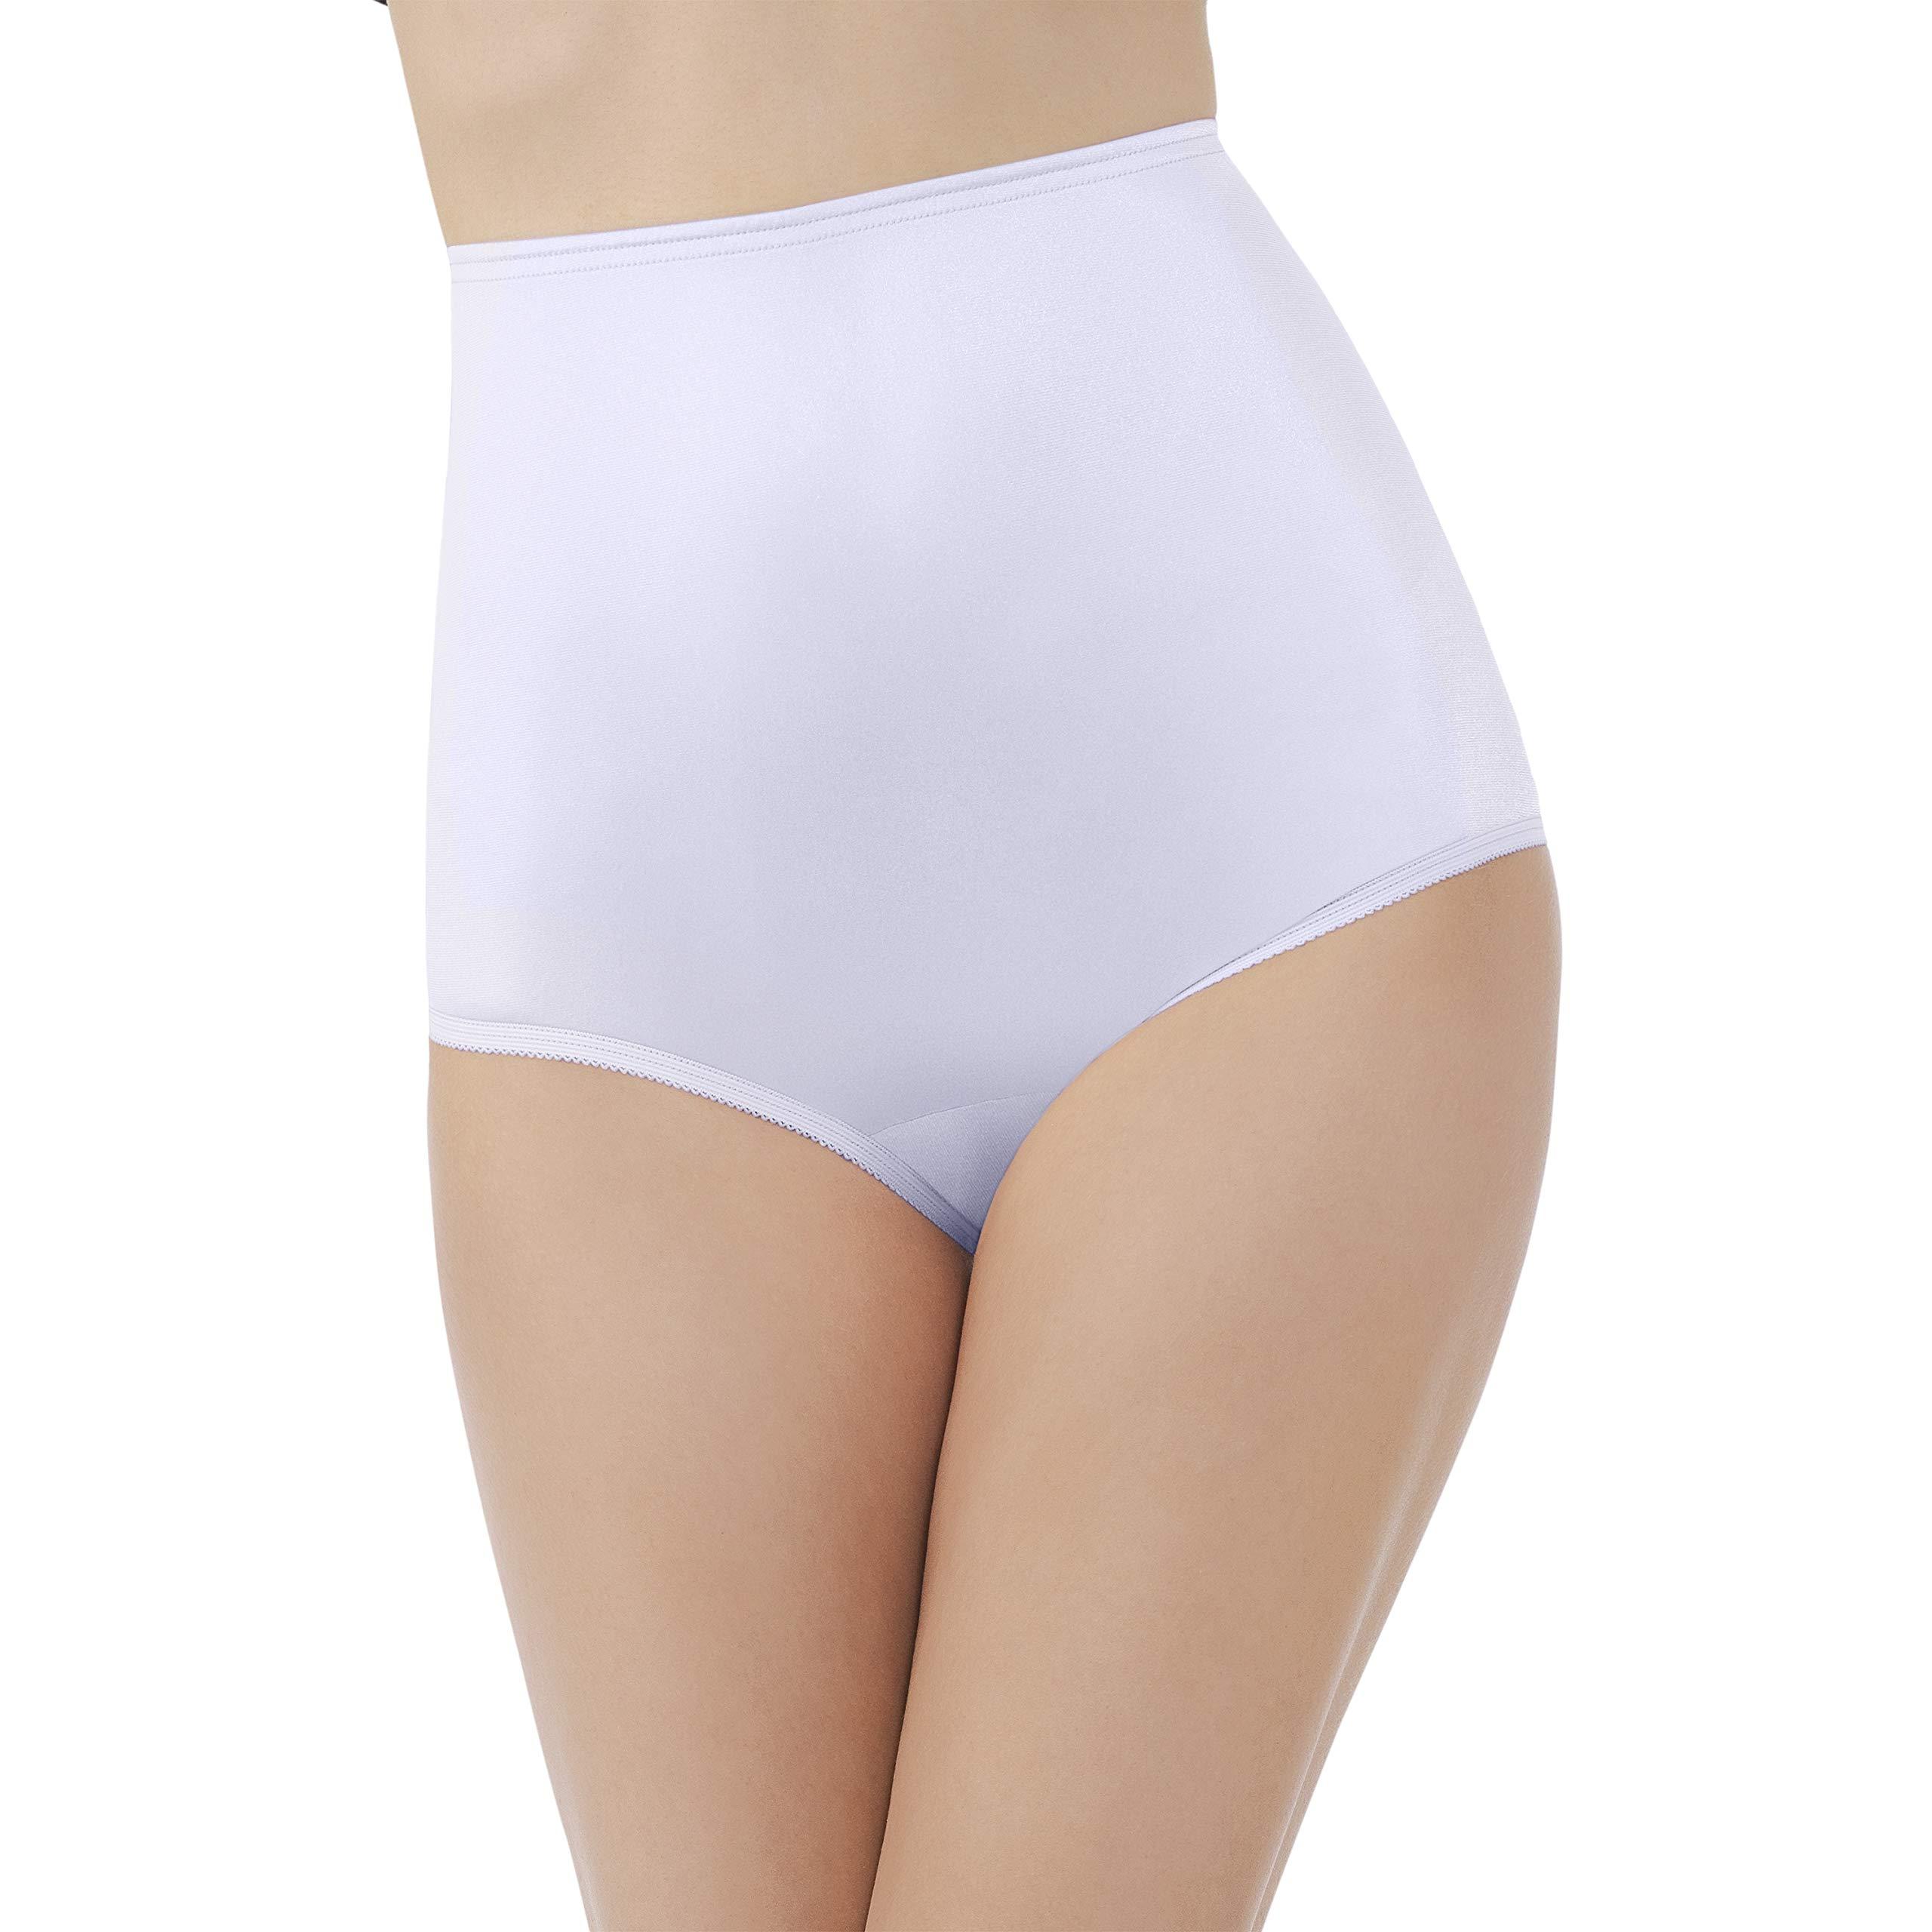 Vanity Fair Women's Underwear Perfectly Yours Traditional Nylon Brief Panties